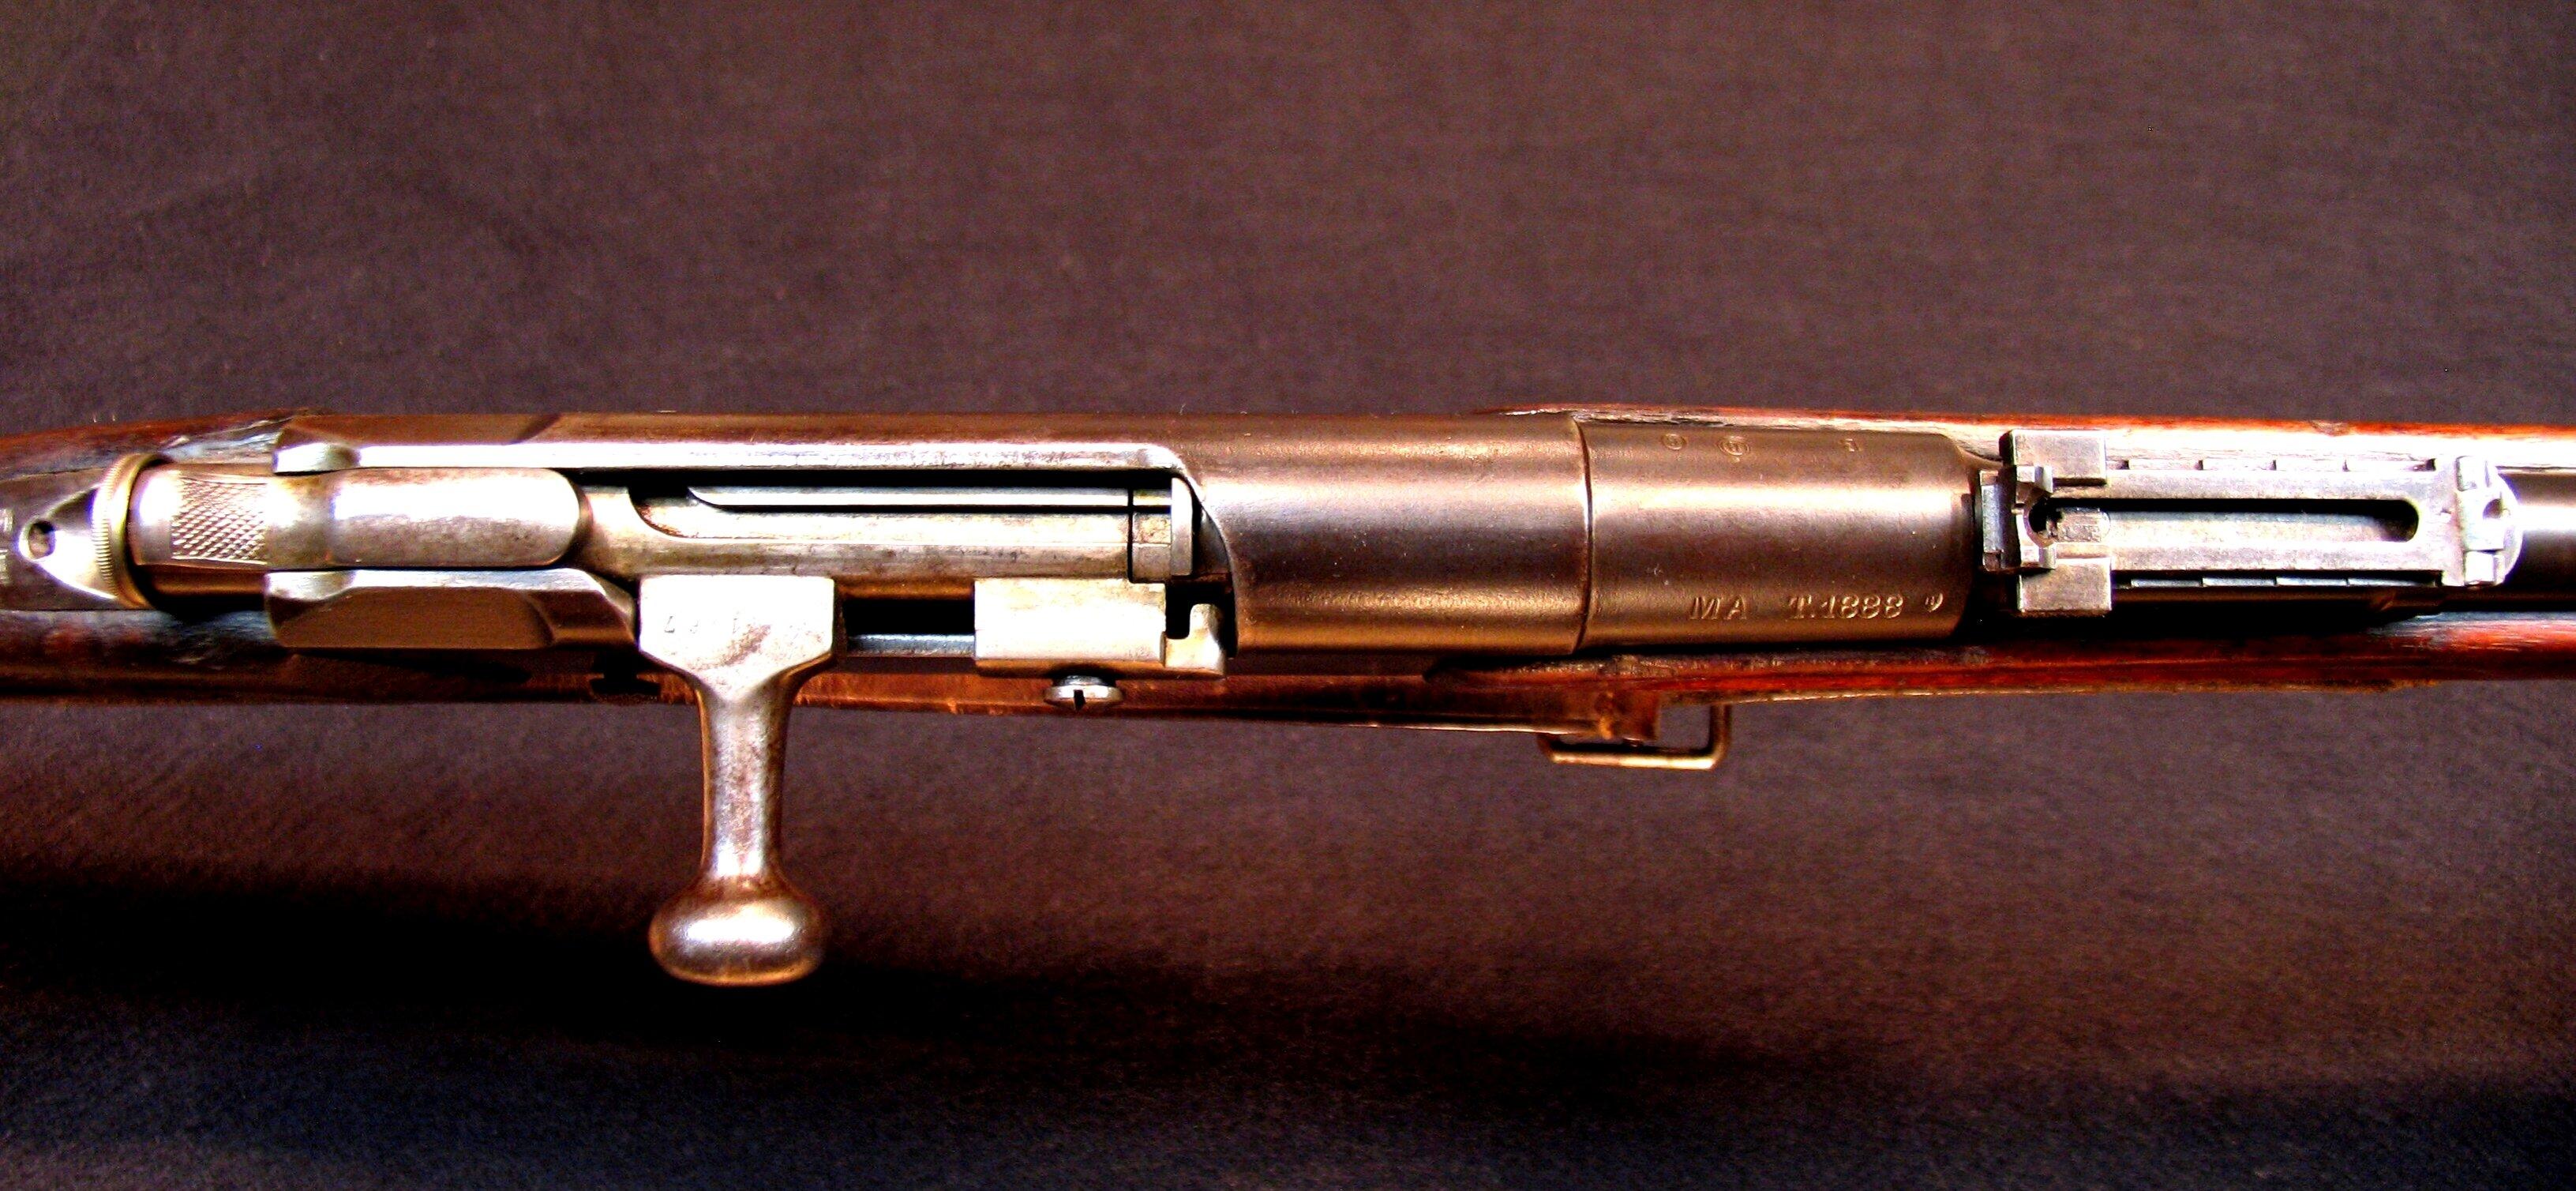 Click image for larger version.  Name:Mle 1886 Lebel Rifle 01B (3).jpg Views:5 Size:767.9 KB ID:3687195